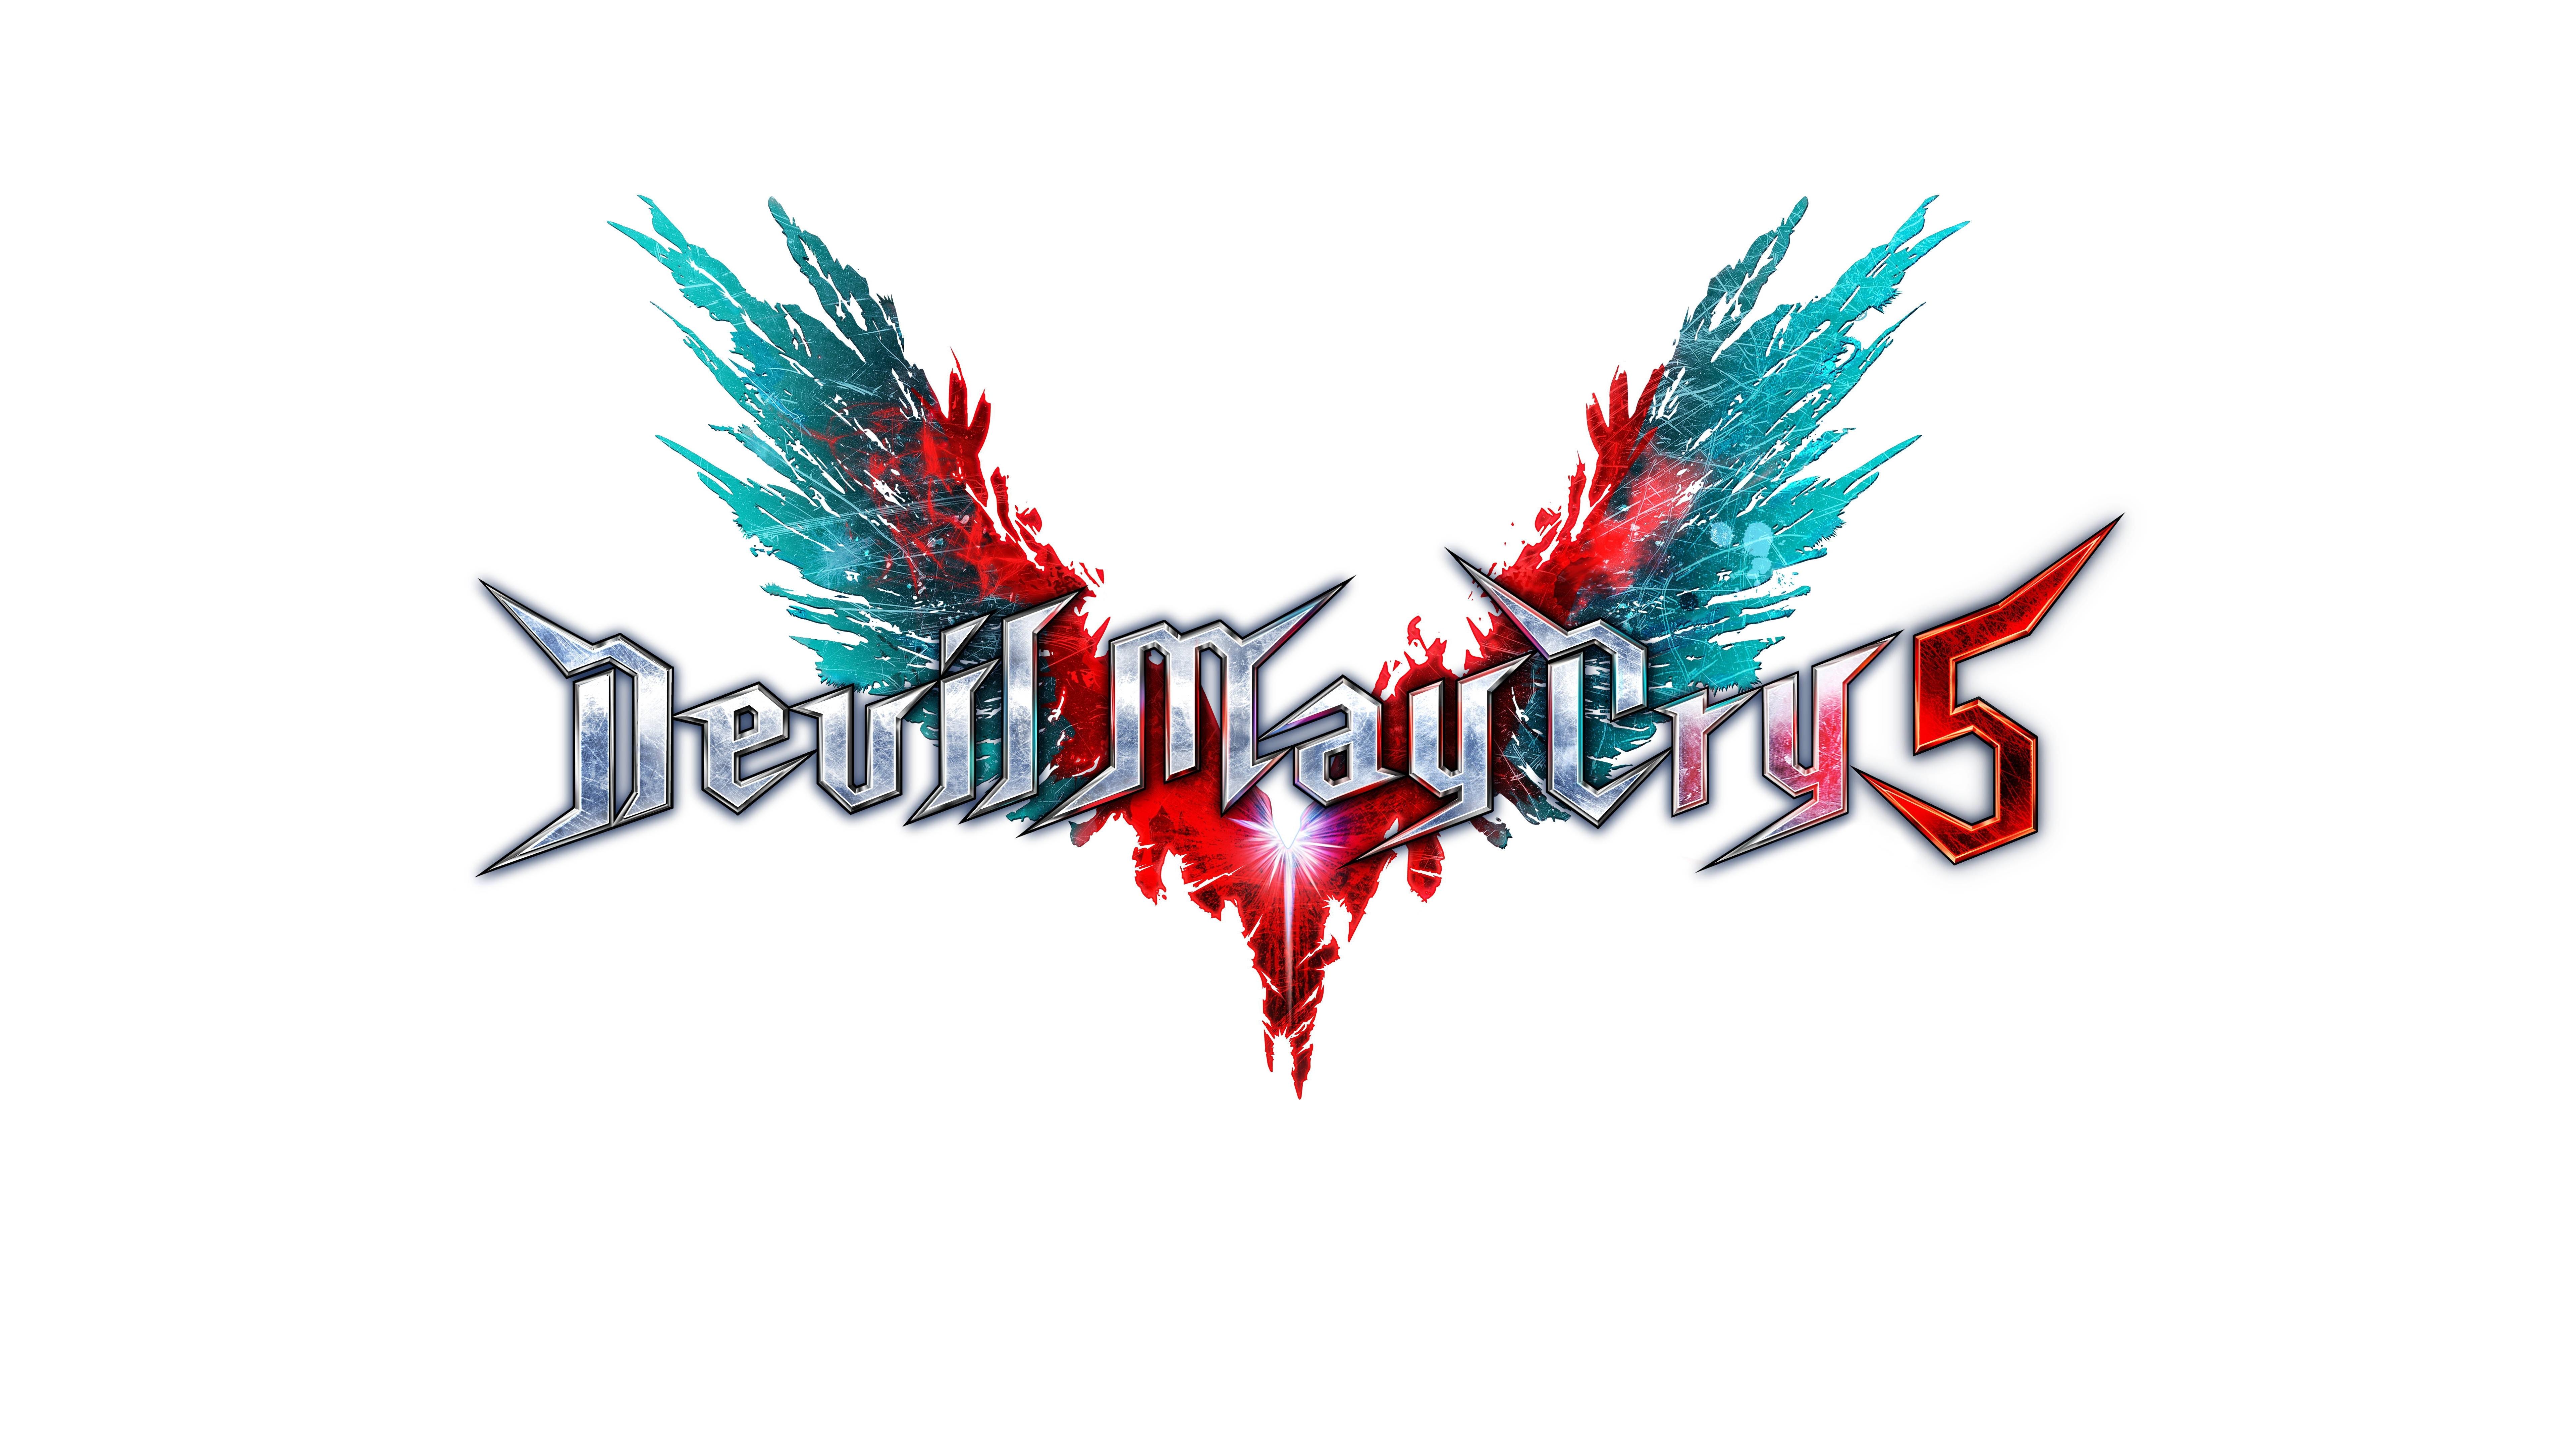 Логотип - Devil May Cry 5 8K, Арт